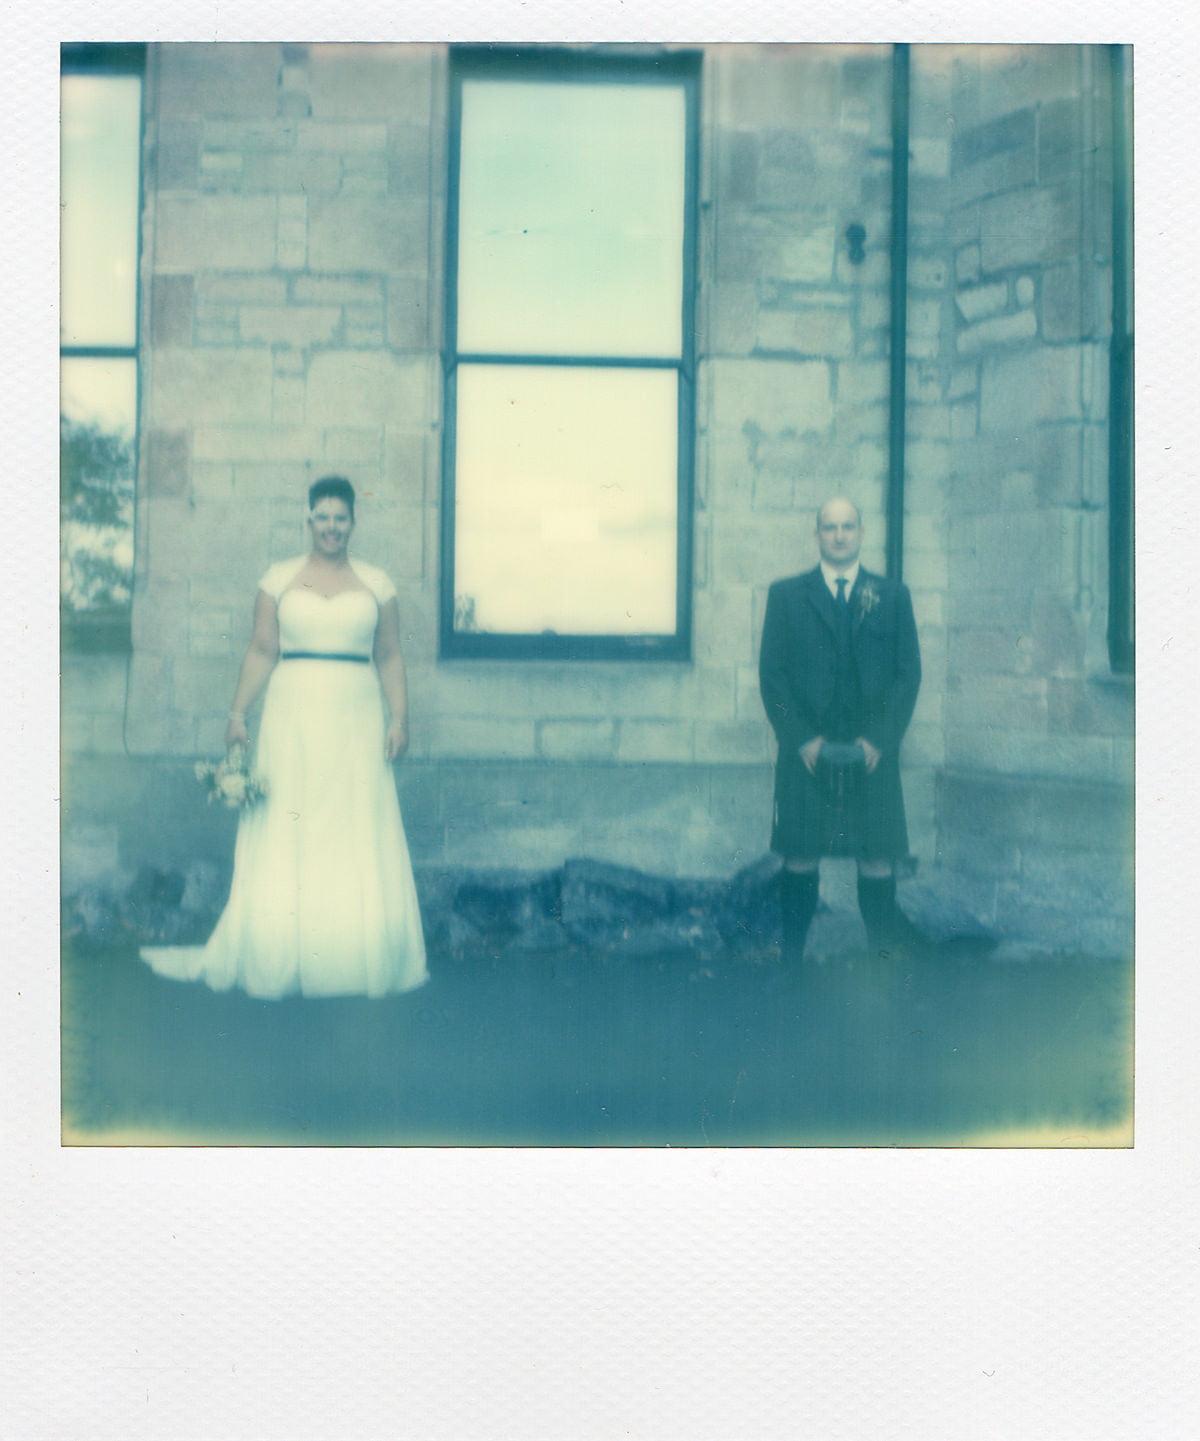 polaroid stirling wedding photography